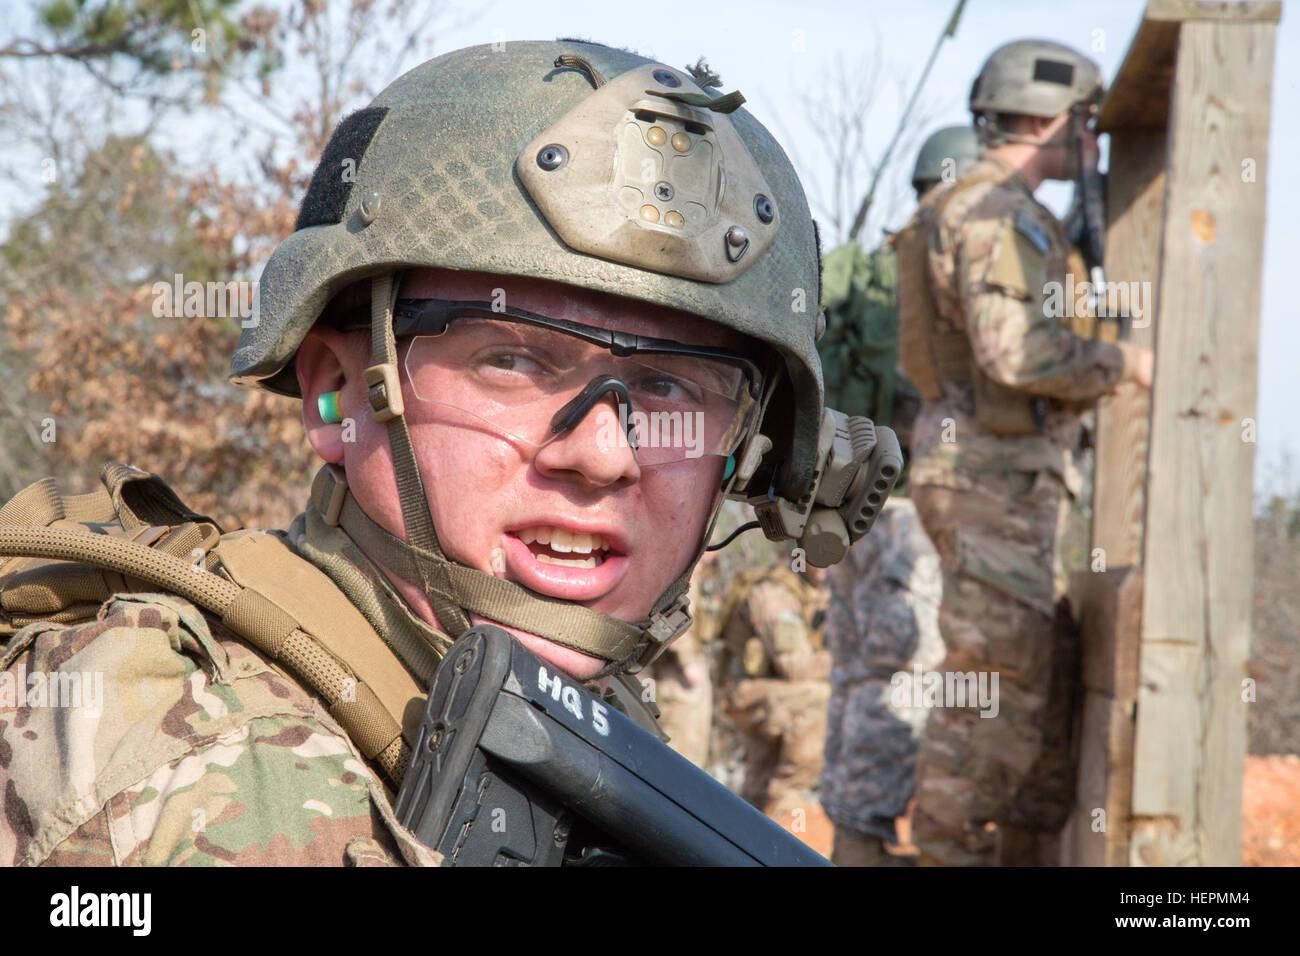 U S  Army soldiers, infantryman assigned to Pathfinder